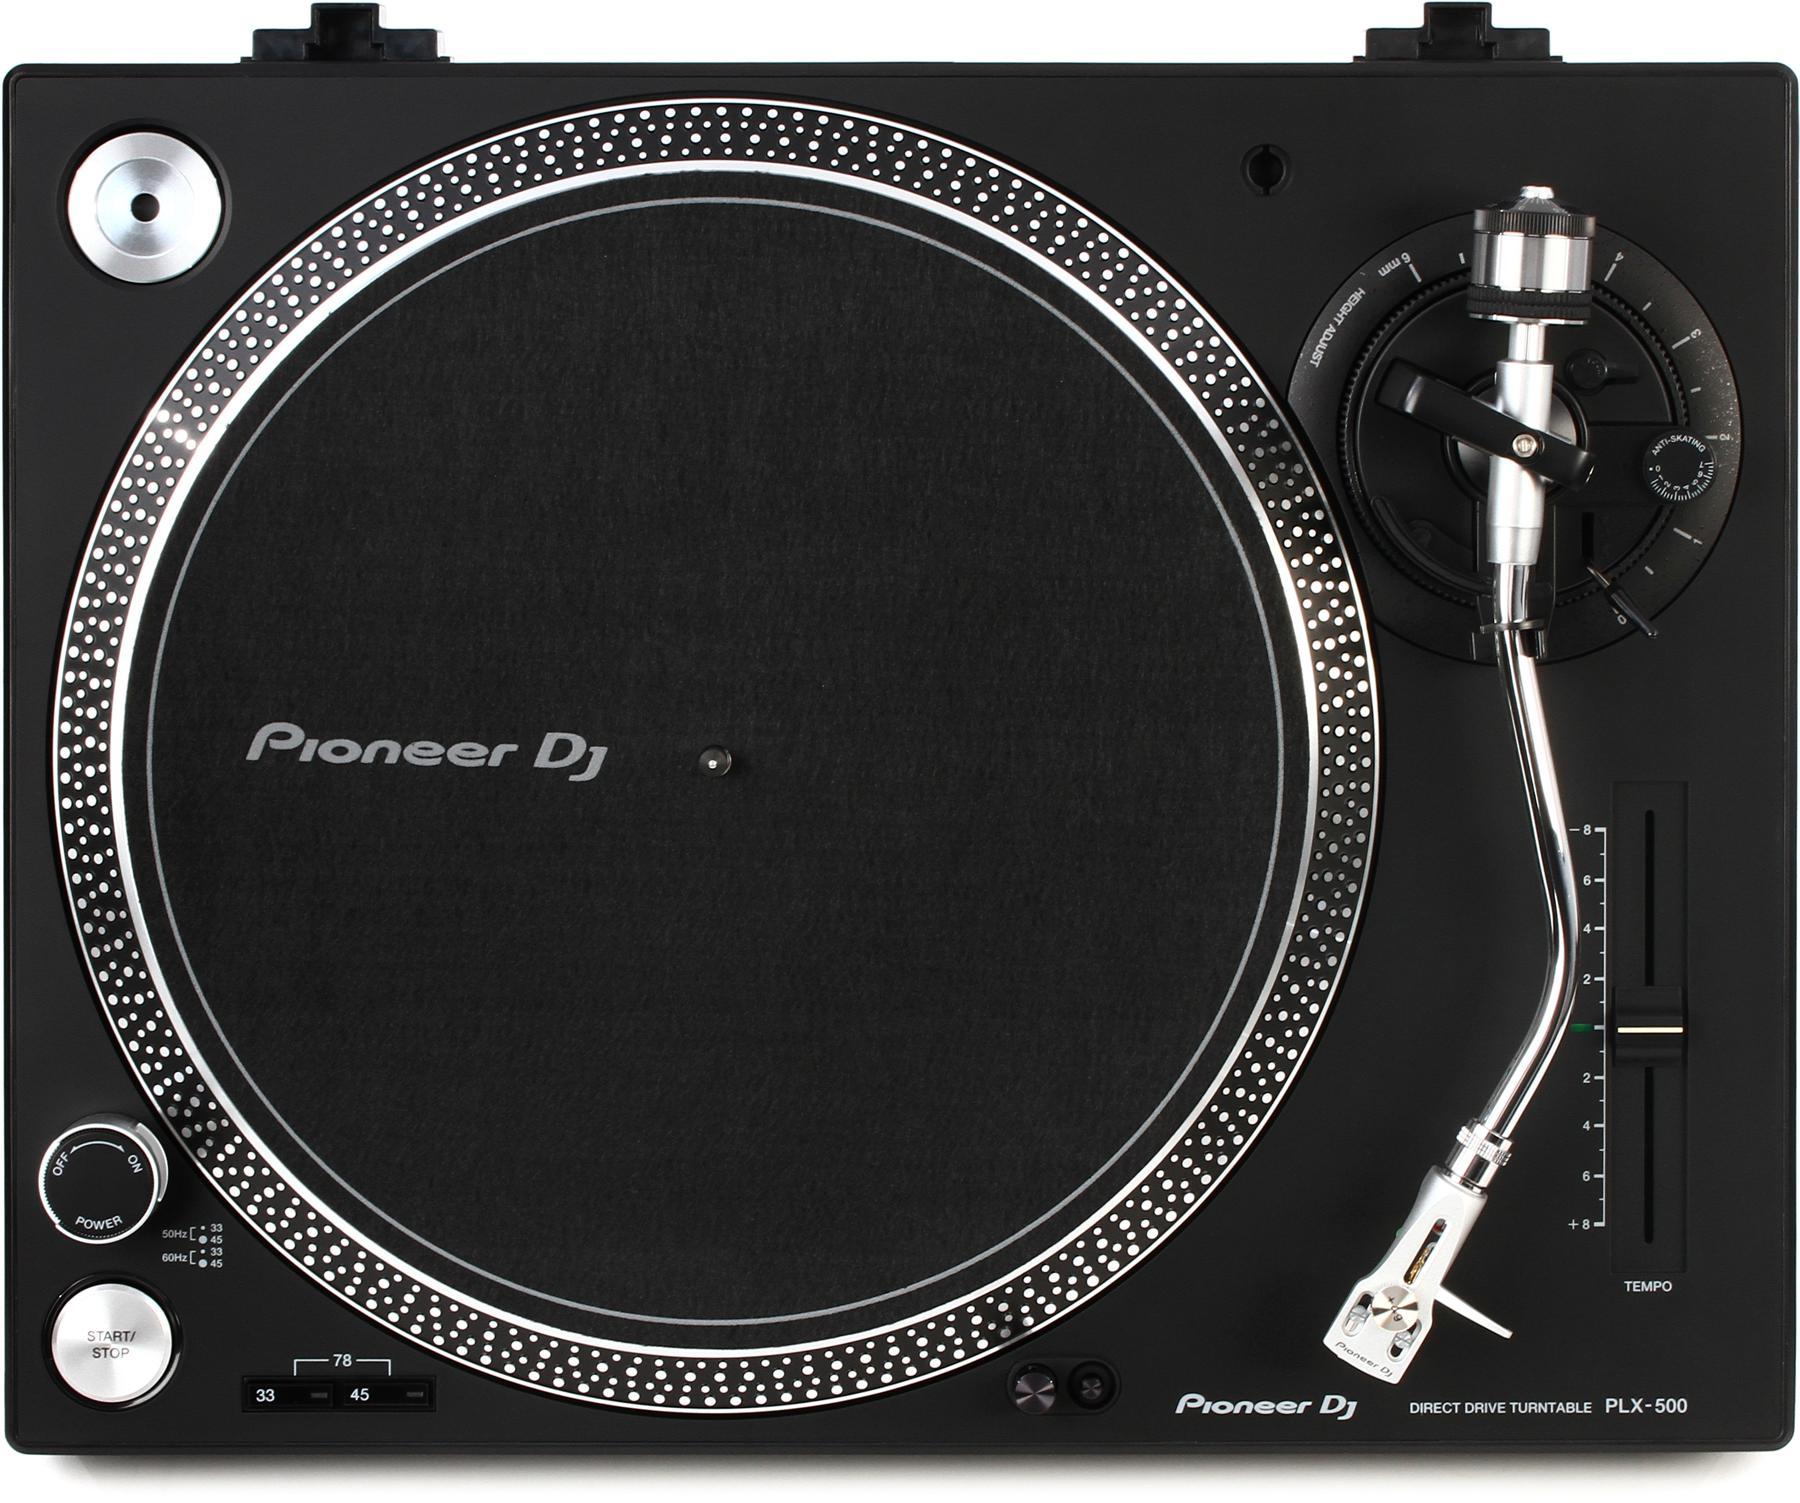 5. Pioneer DJ PLX-500 Direct Drive Turntable